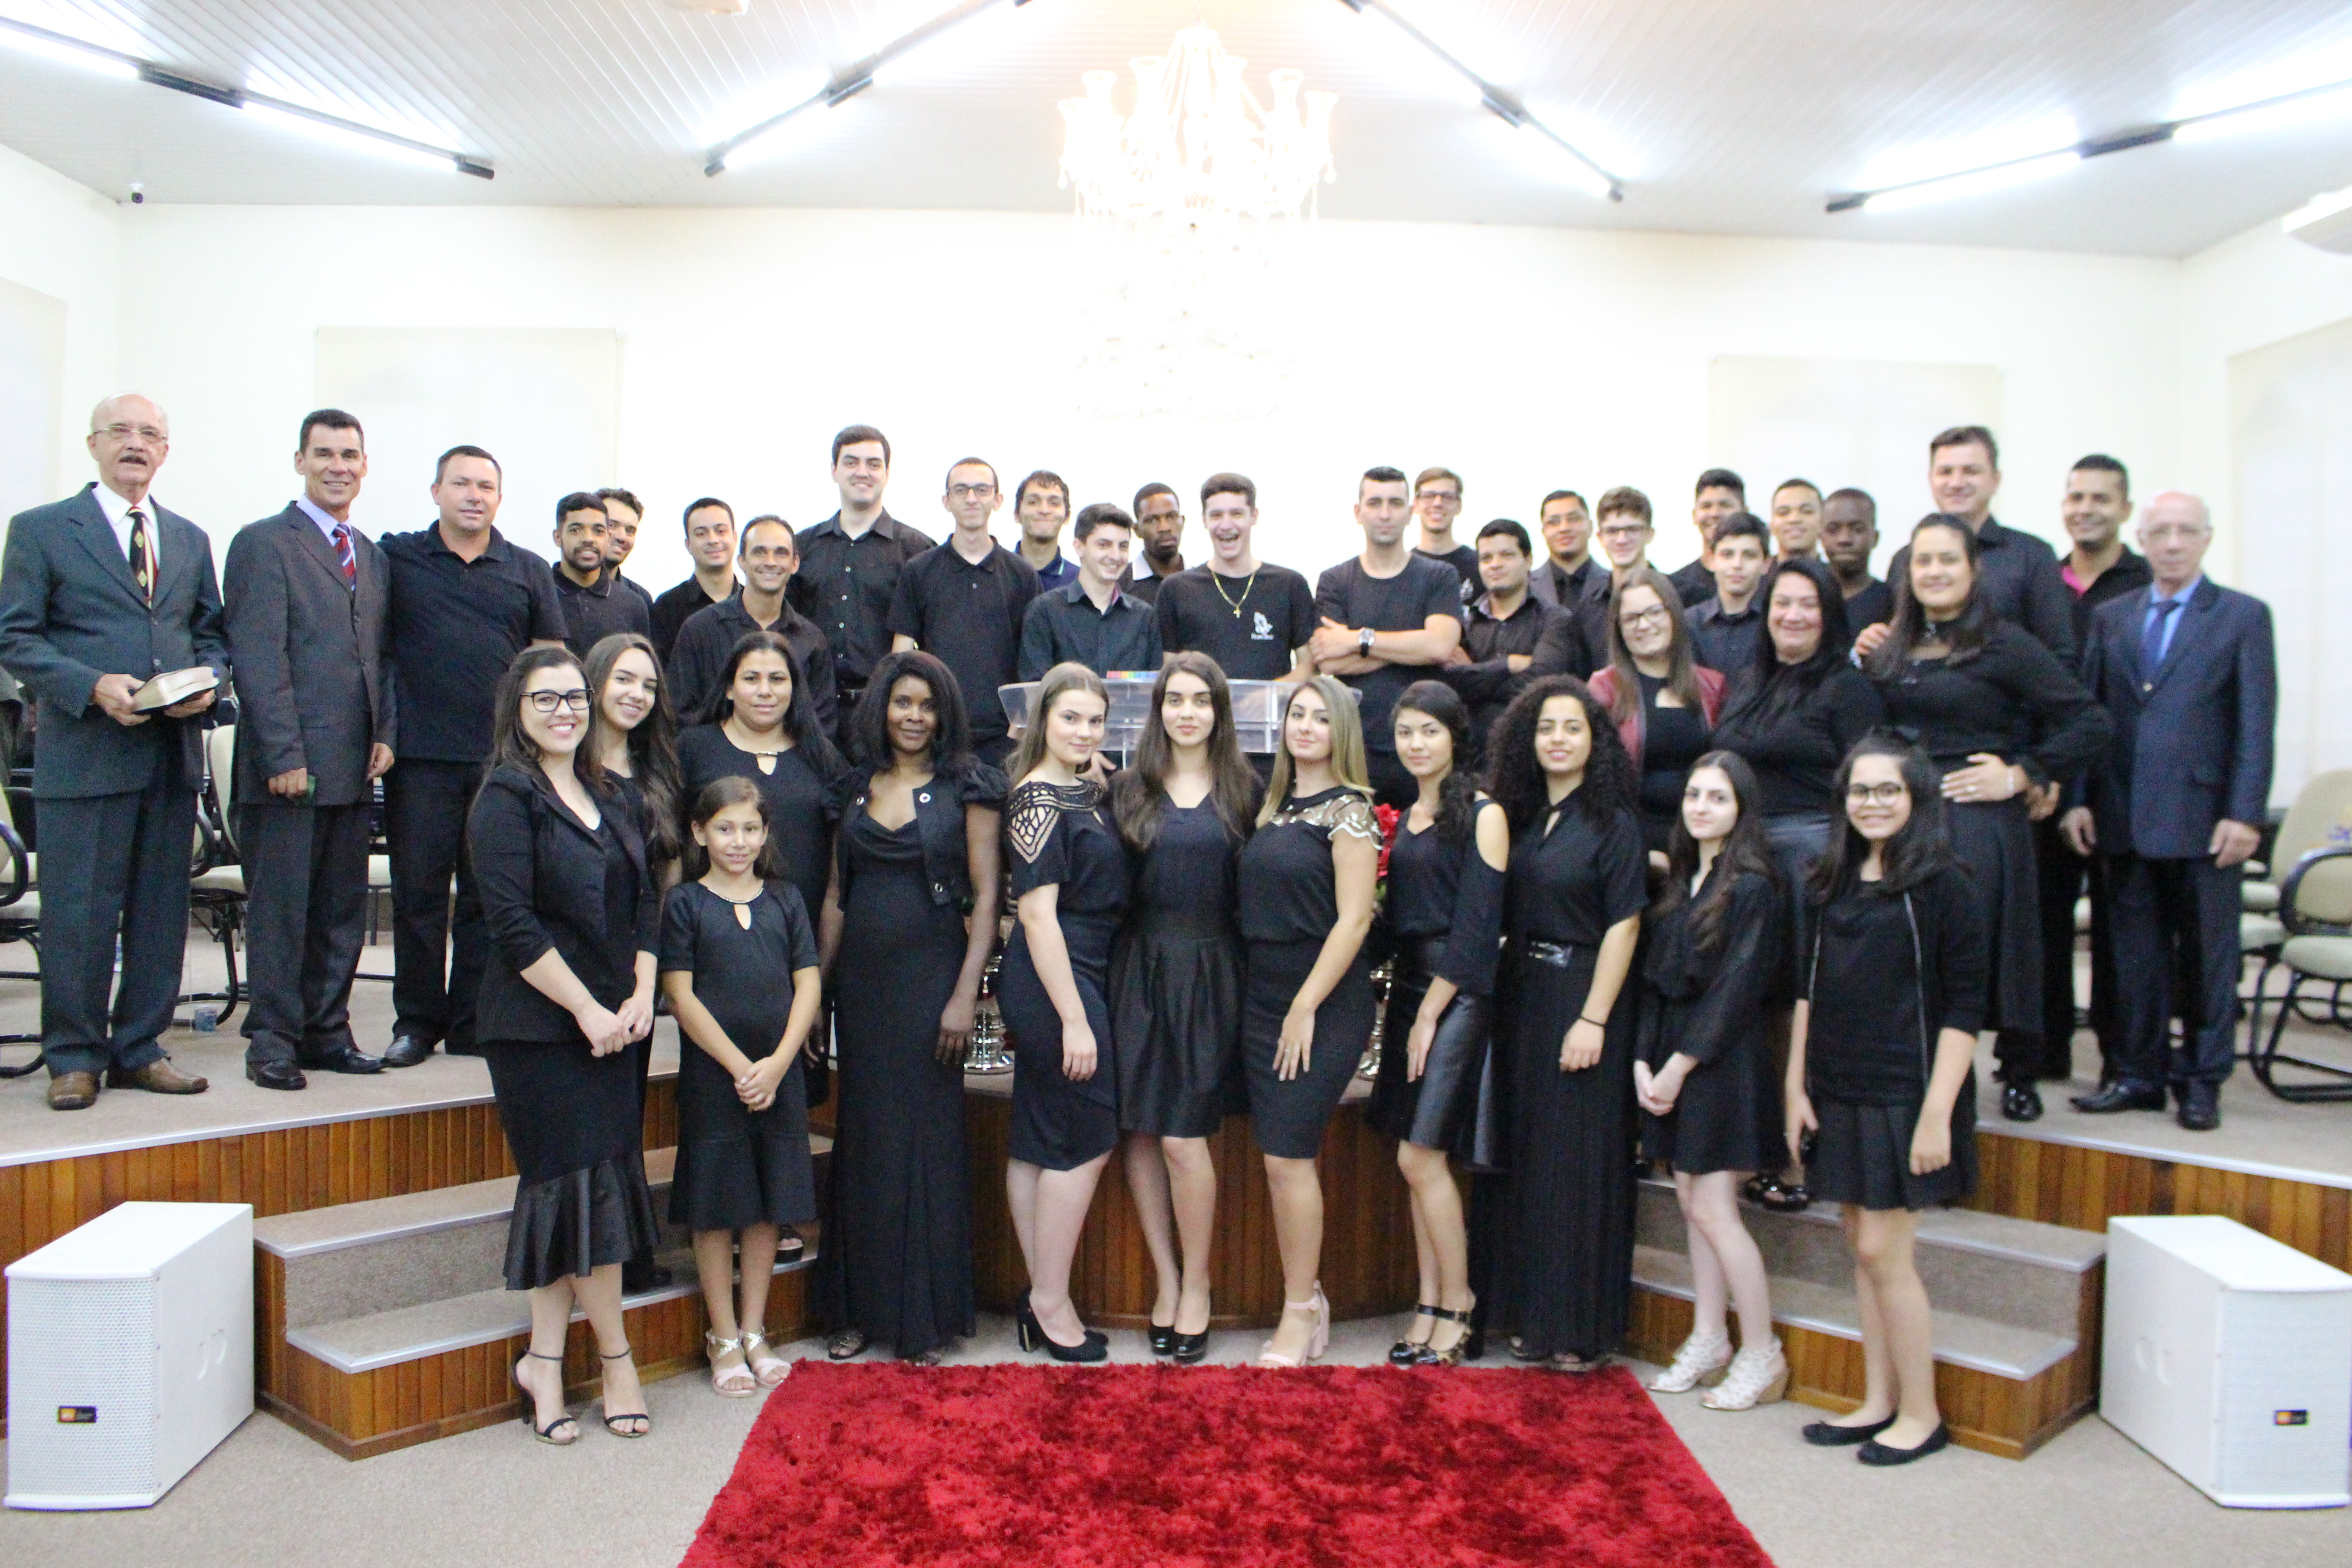 Aniversário Orquestra Sinfonia de Louvor